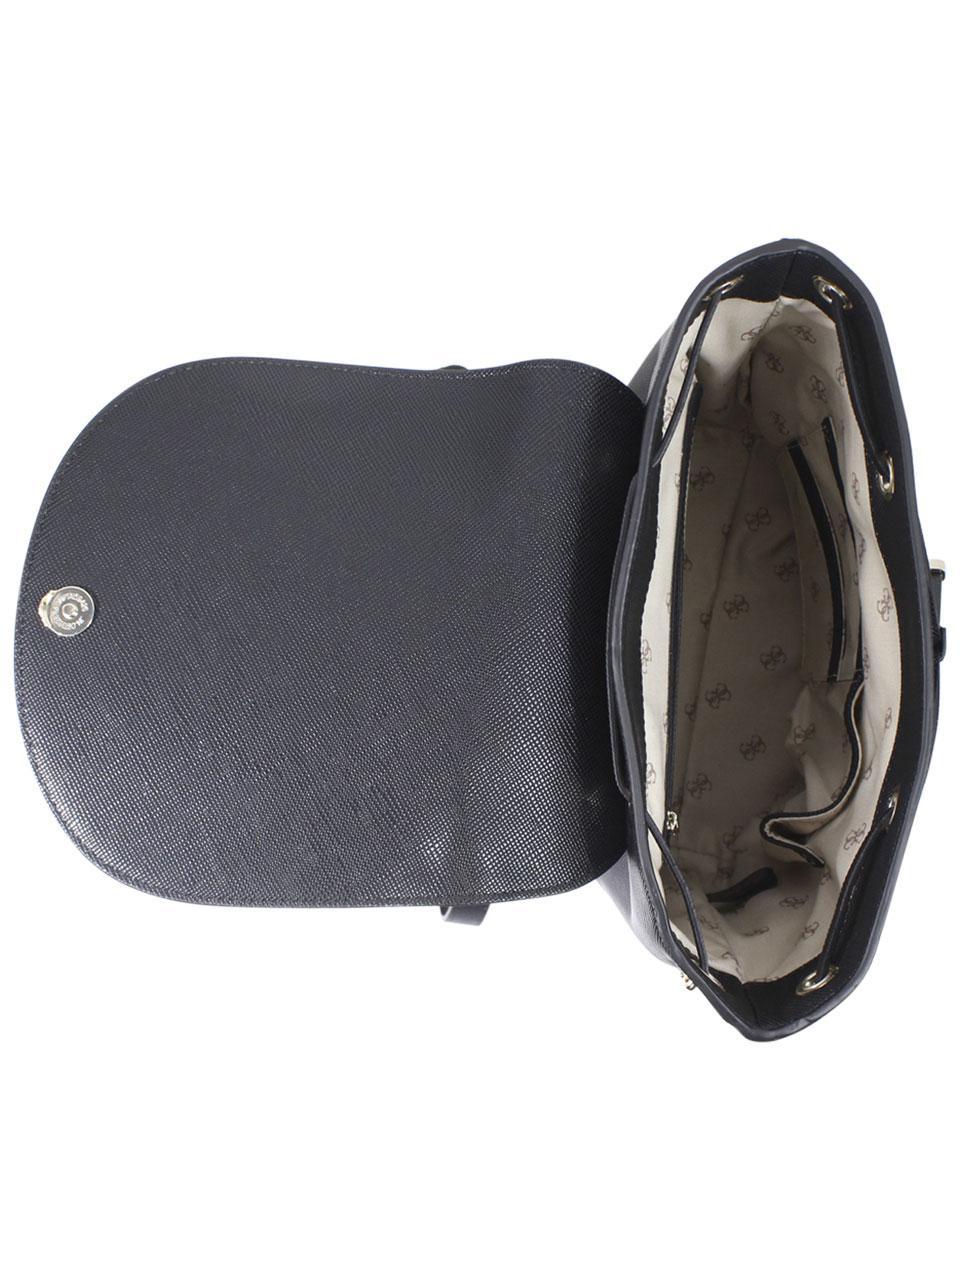 Guess-Women-039-s-Varsity-Pop-Pin-Up-Backpack-Bag thumbnail 10